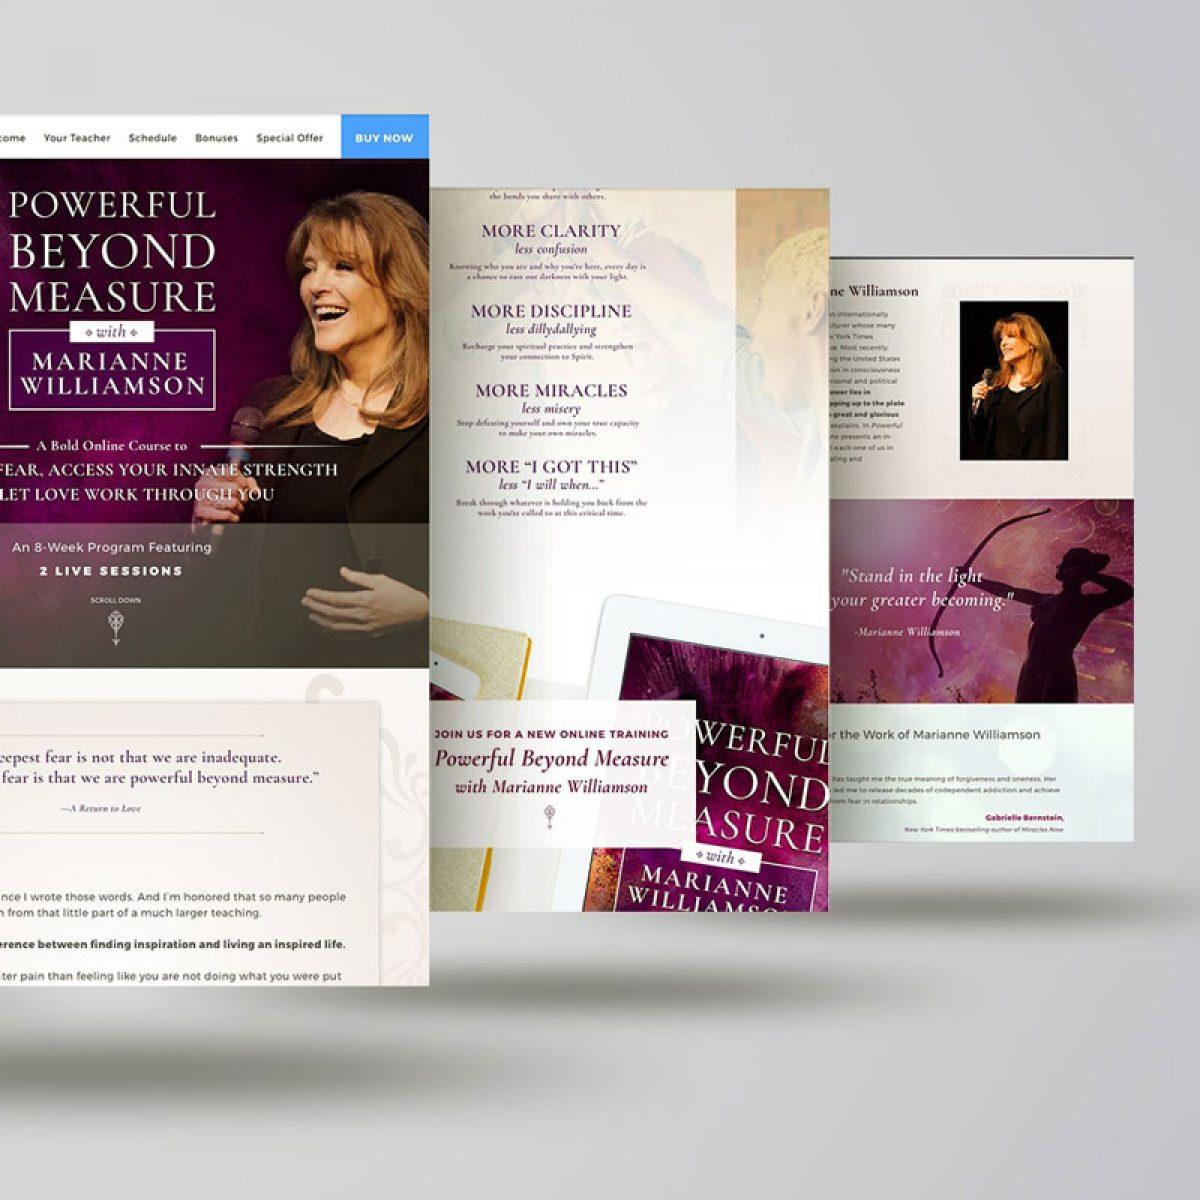 marianne-williamsonpowerful-beyond-measure-website-design